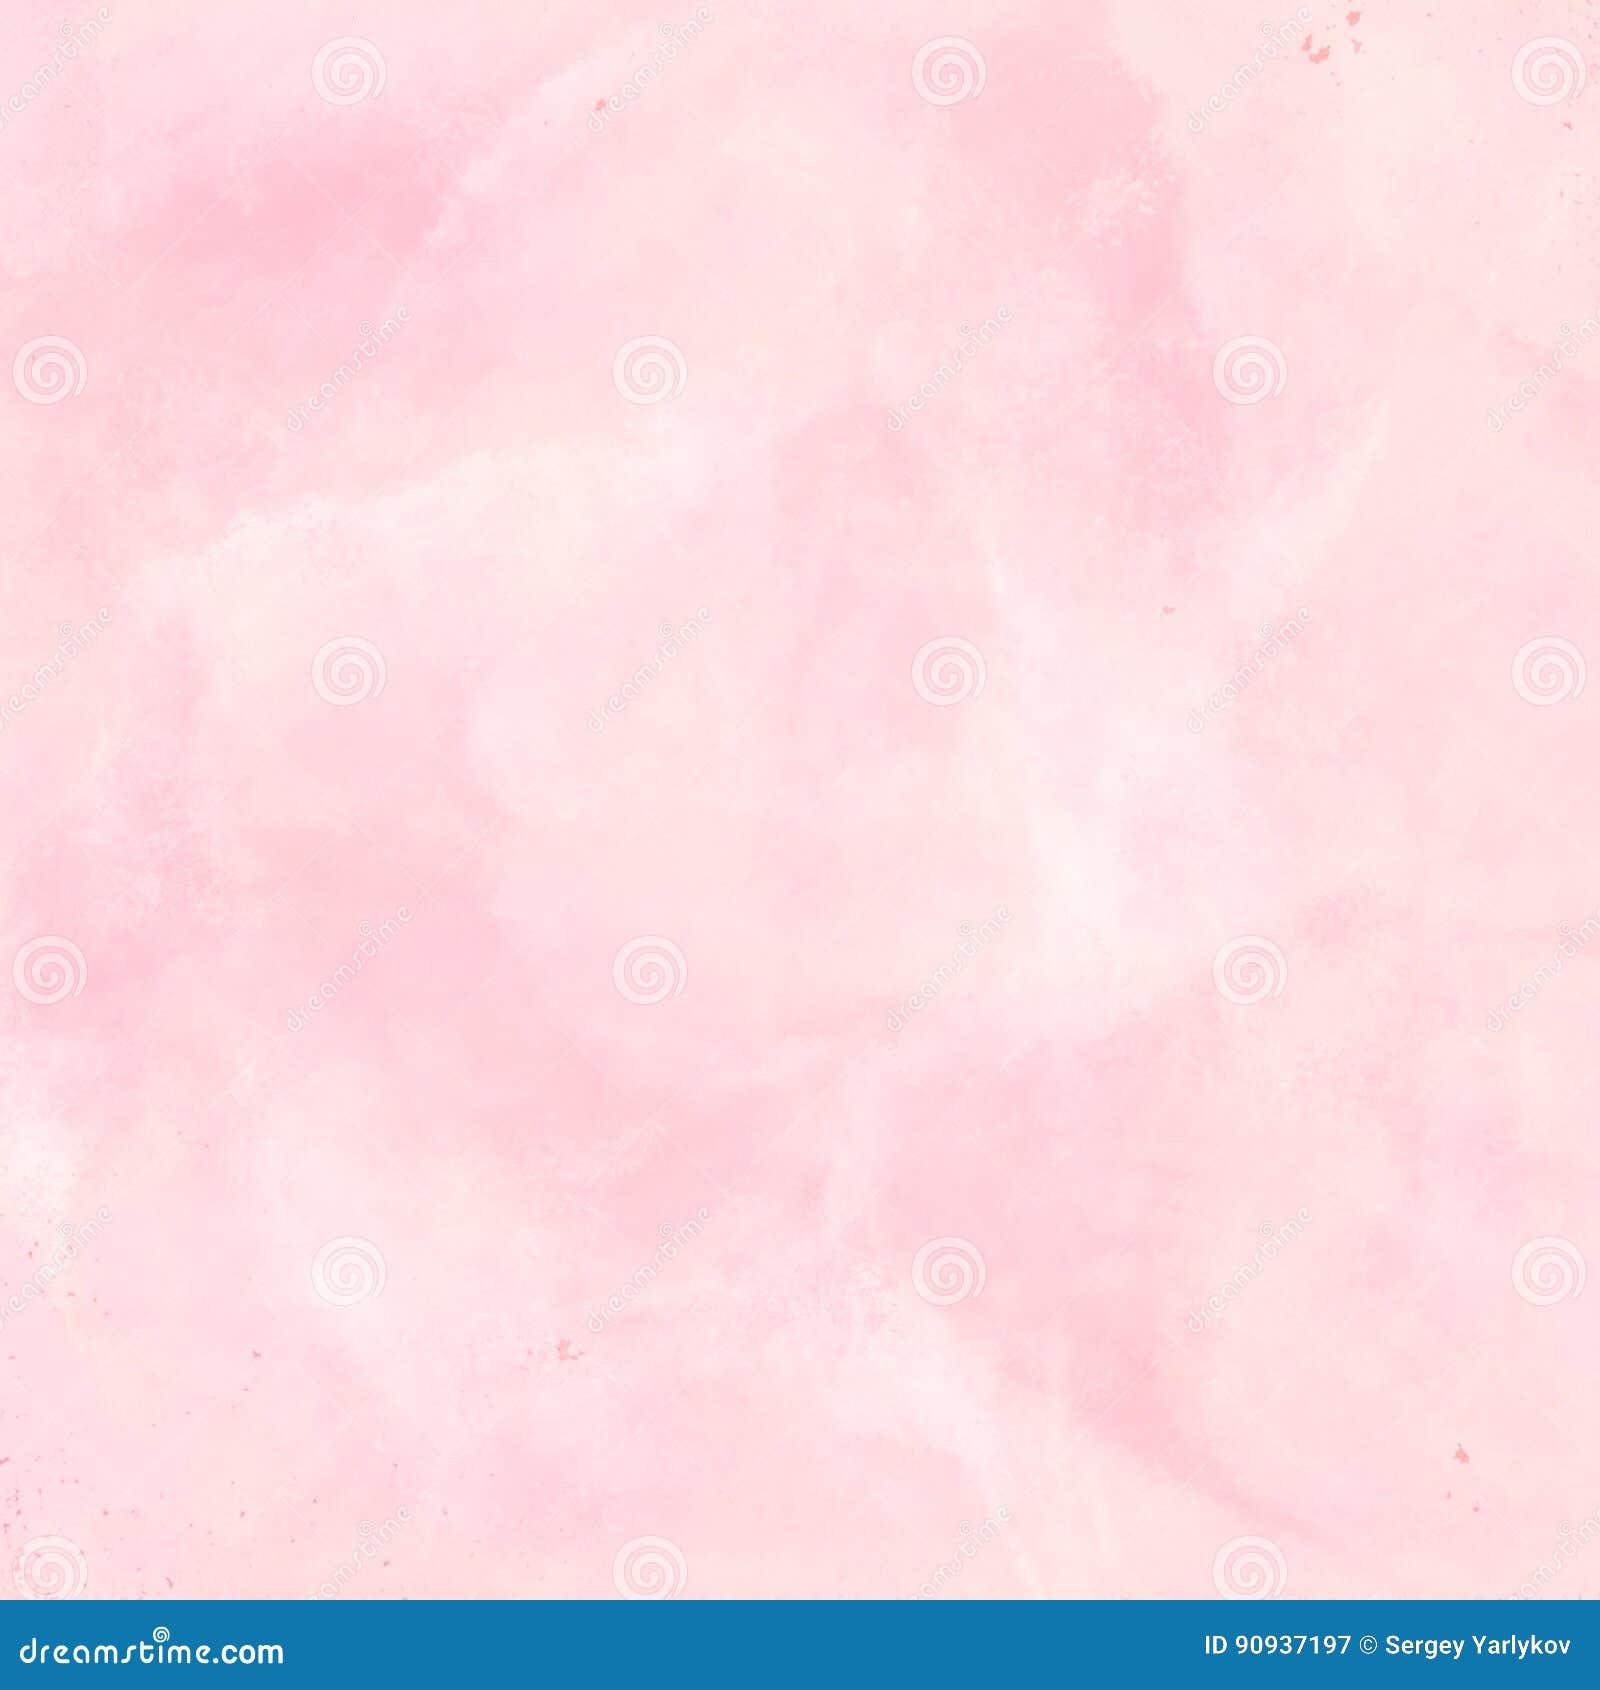 Blog Post 5463 in addition Fondos 20de 20color 20rosa further Clipart 361990 further Arboles Jardines Y Palmeras further File Anime Girl Msyugioh123 28662838 800 572. on rosita background